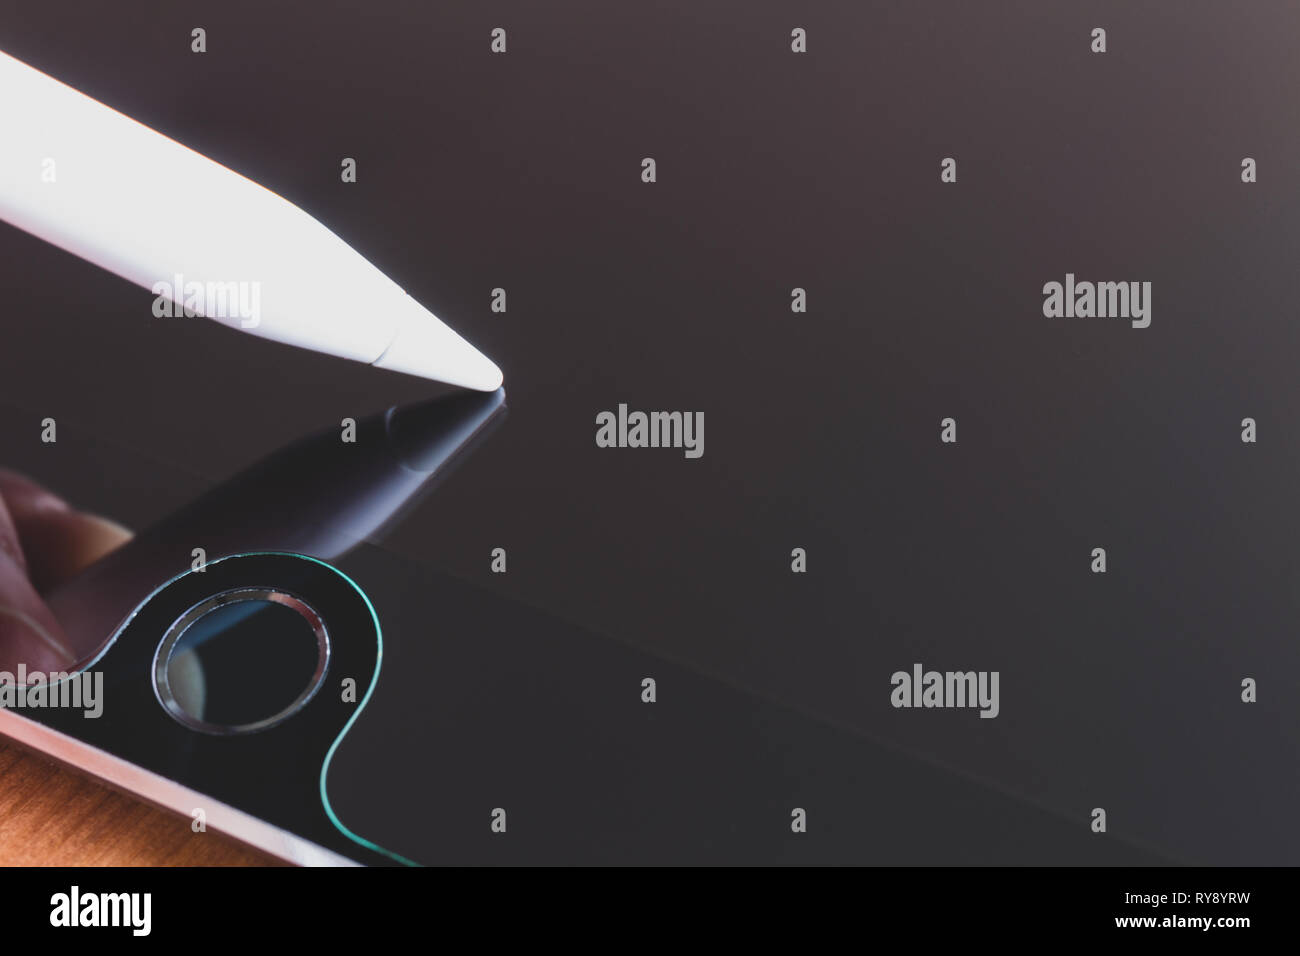 Ipad Pro Stock Photos & Ipad Pro Stock Images - Alamy